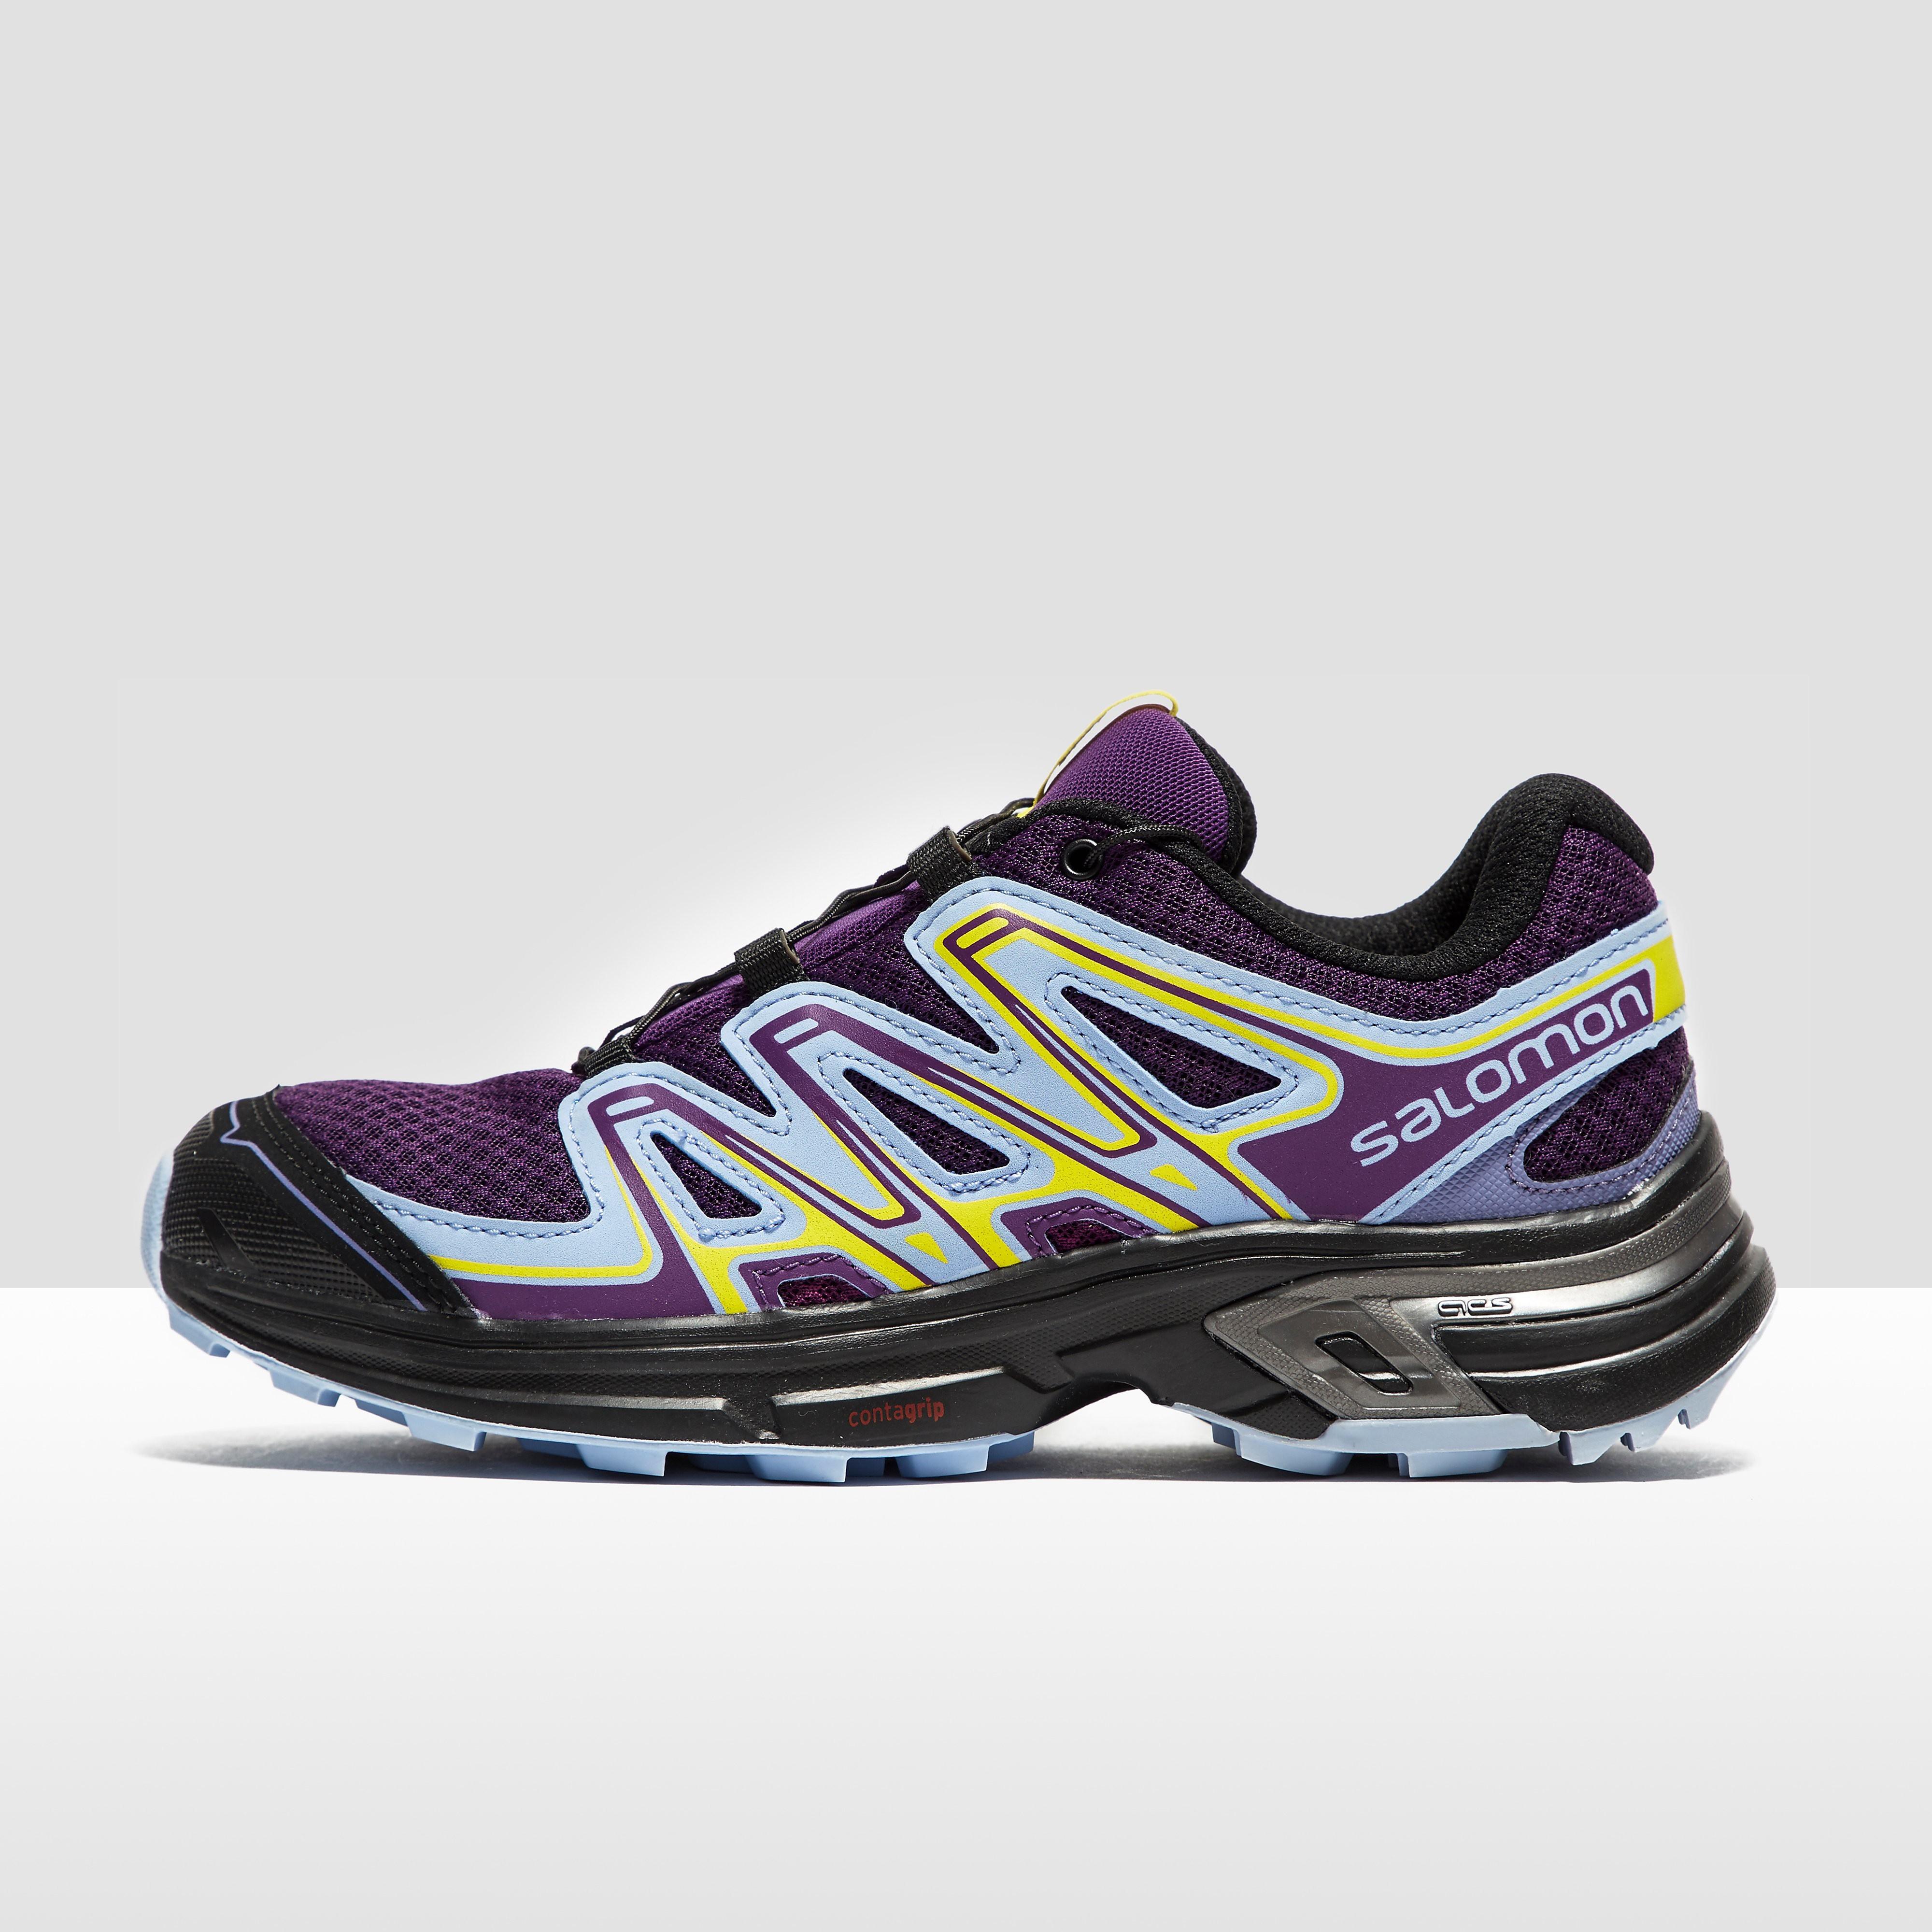 Salomon Wings Flyte 2 Women's Trail Running Shoes